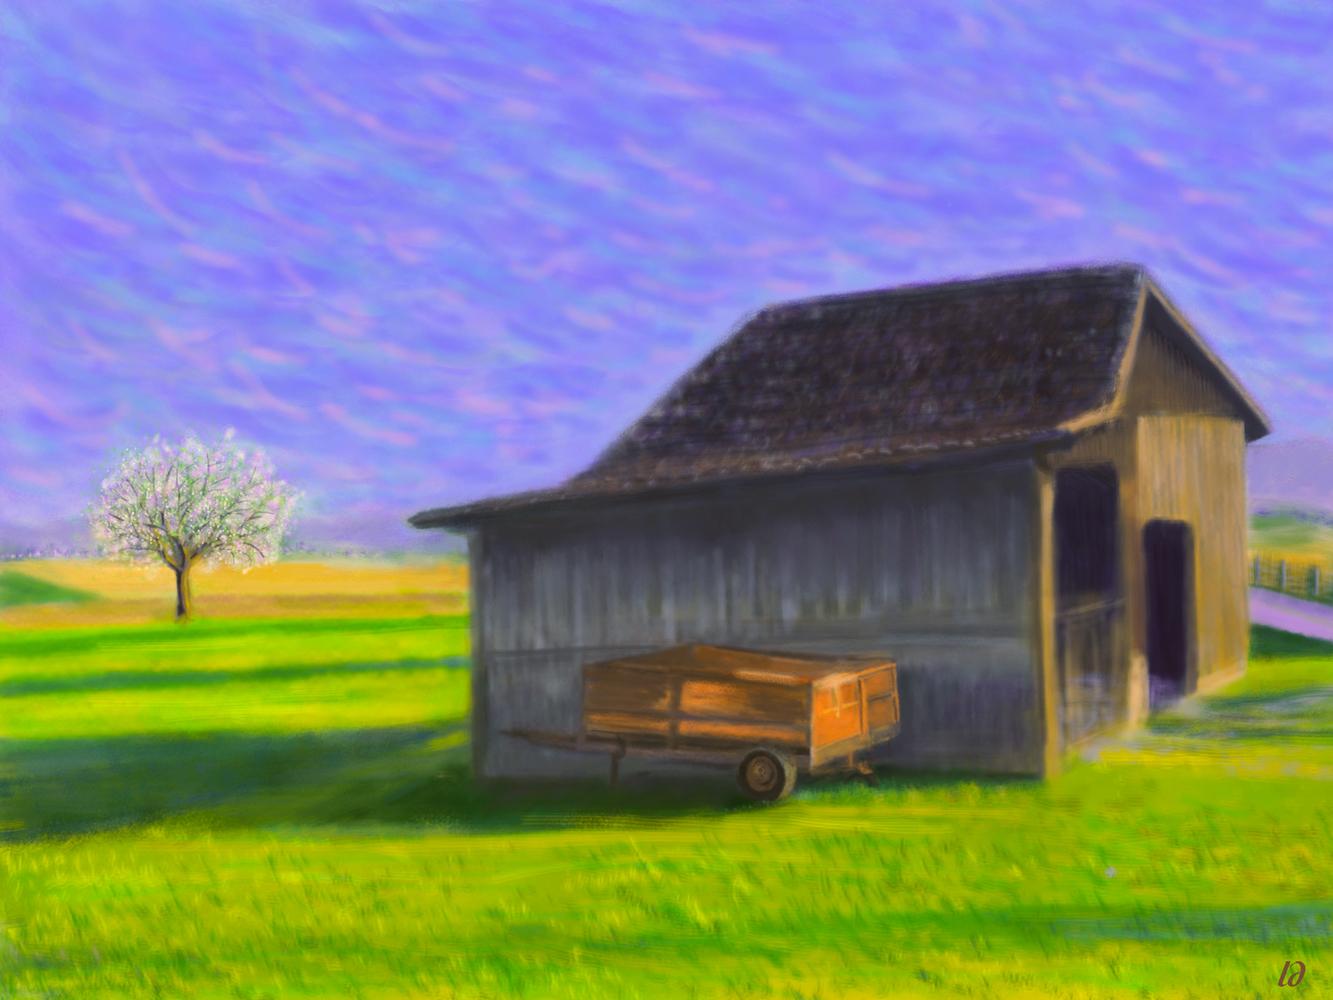 La remorque, Penthalaz. Digital painting, 54x72, 2017